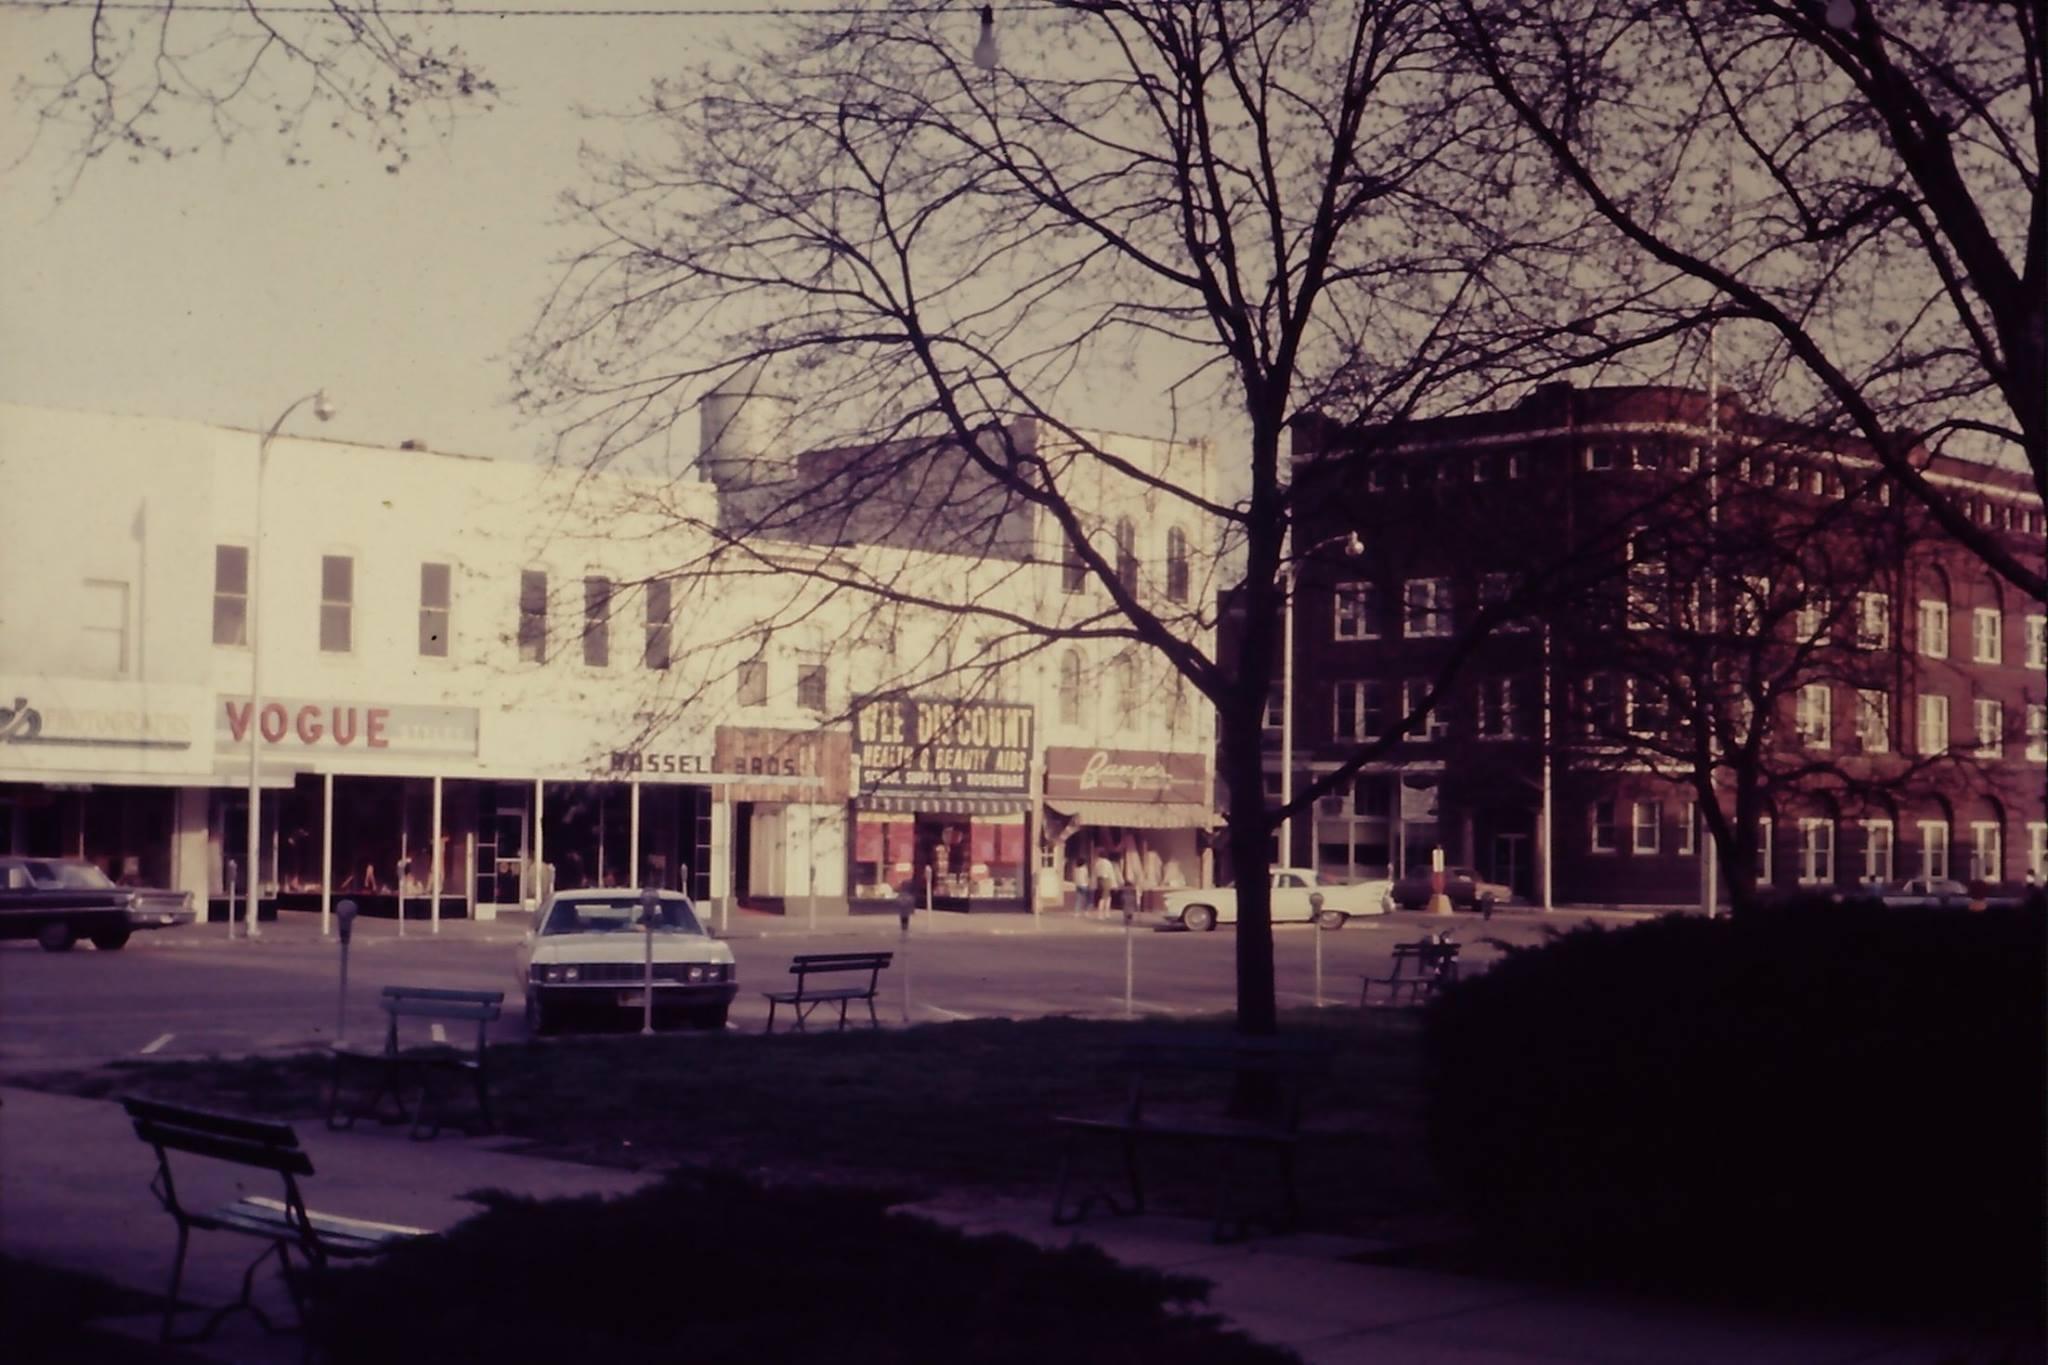 Southeast corner of the square at Marshall, Missouri. Circa 1968